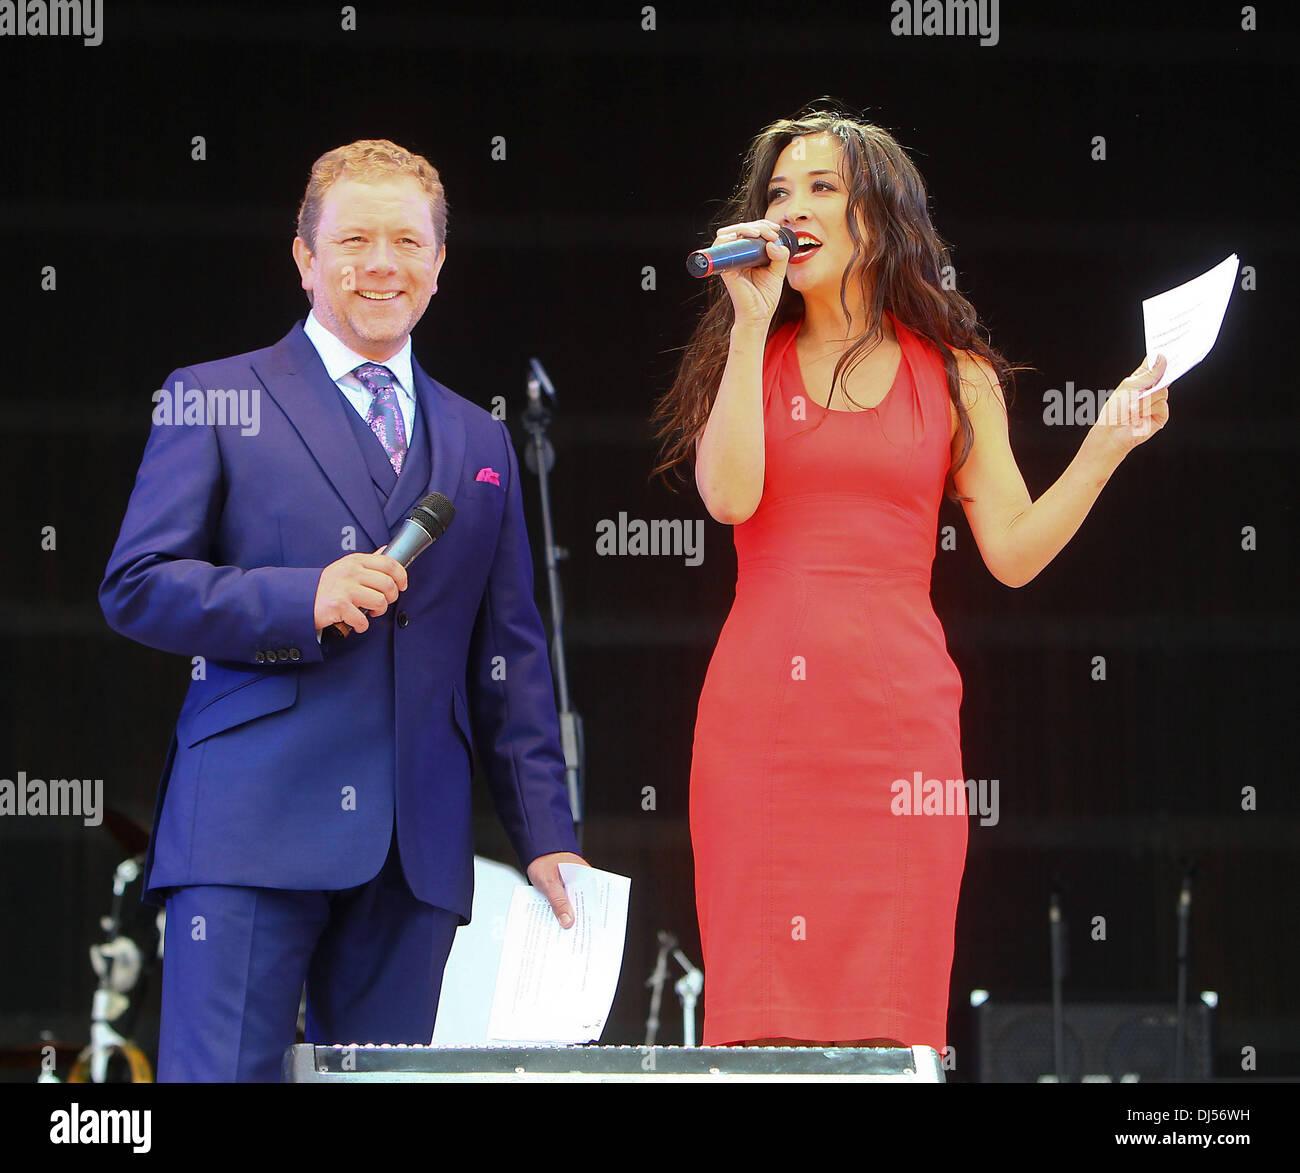 8be6b441834043 Jon Culshaw and Myleene Klass at the Jubilee Family Festival at Hyde Park  London, England